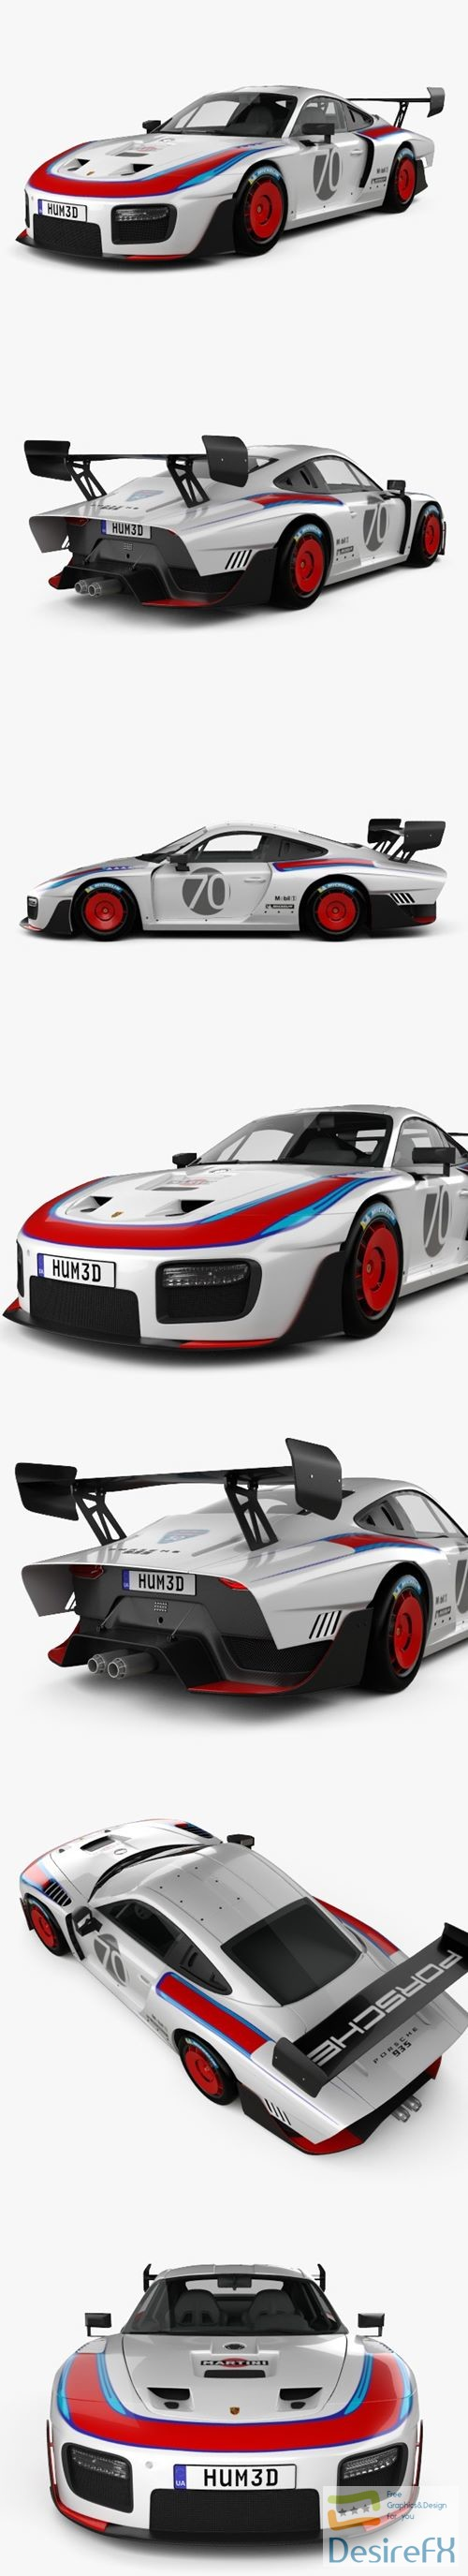 3d-models - Porsche 935 2019 3D Model